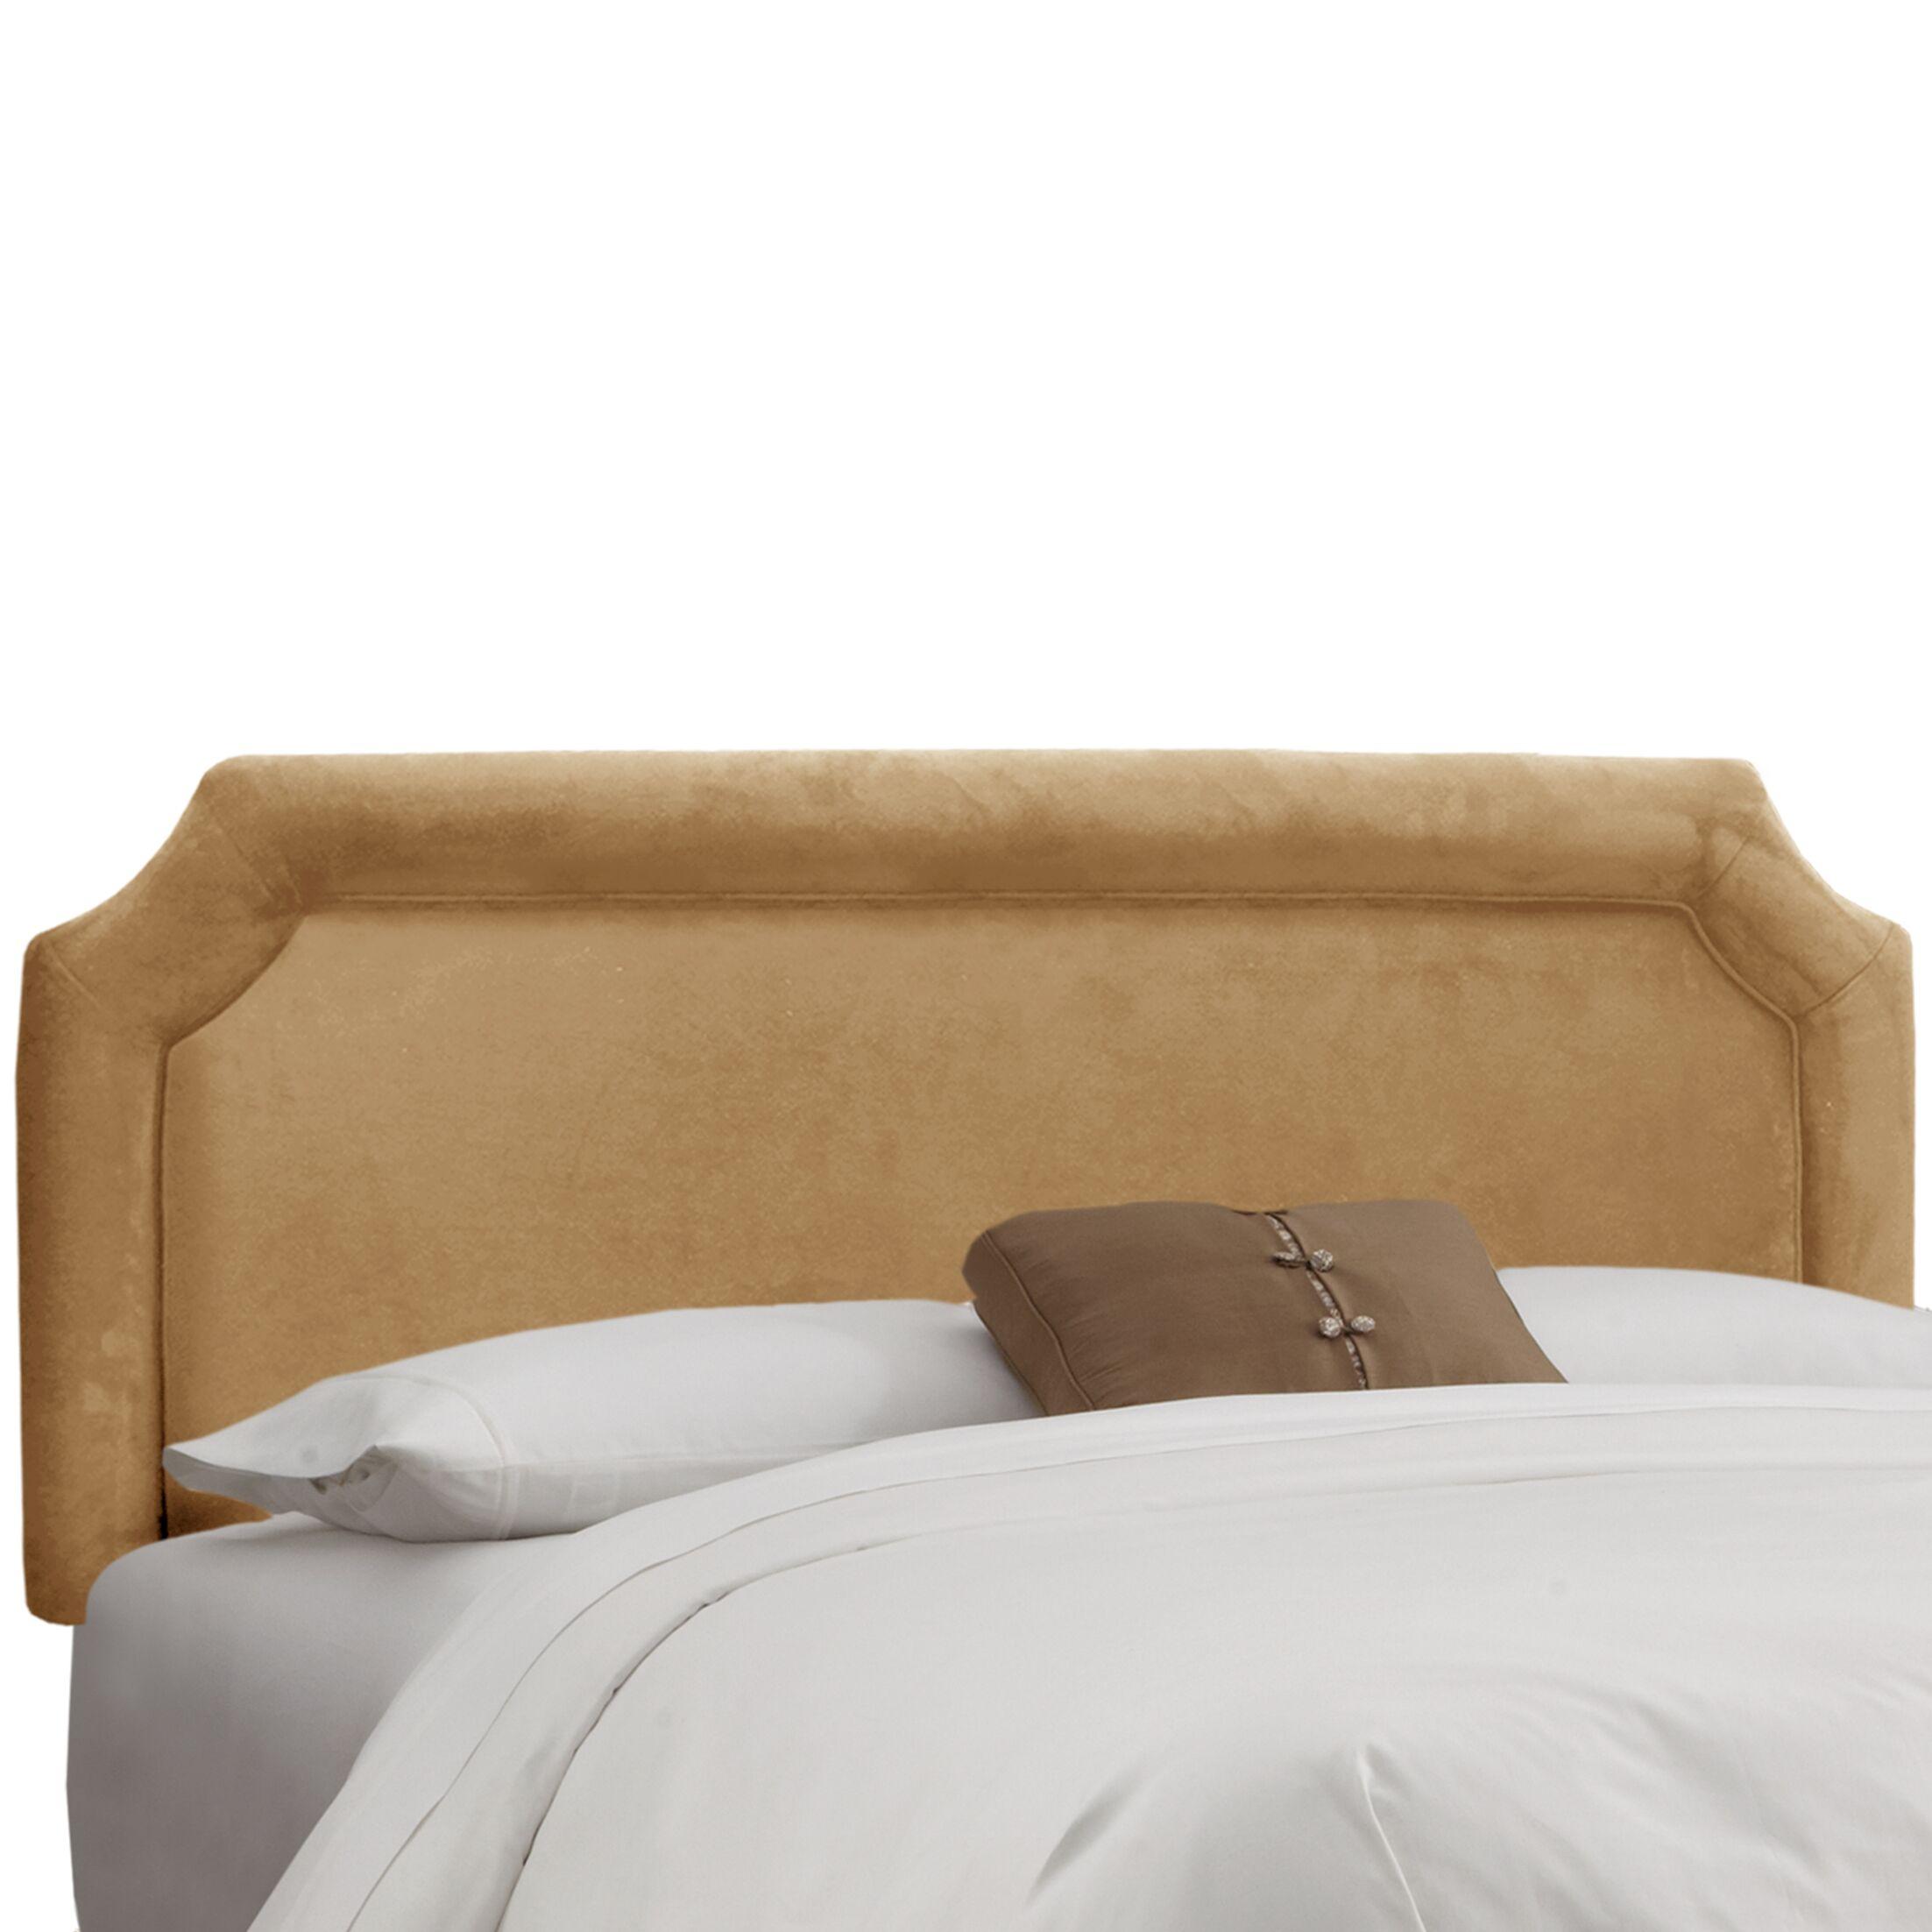 Amber Upholstered Panel Headboard Upholstery: Premier Saddle, Size: Twin